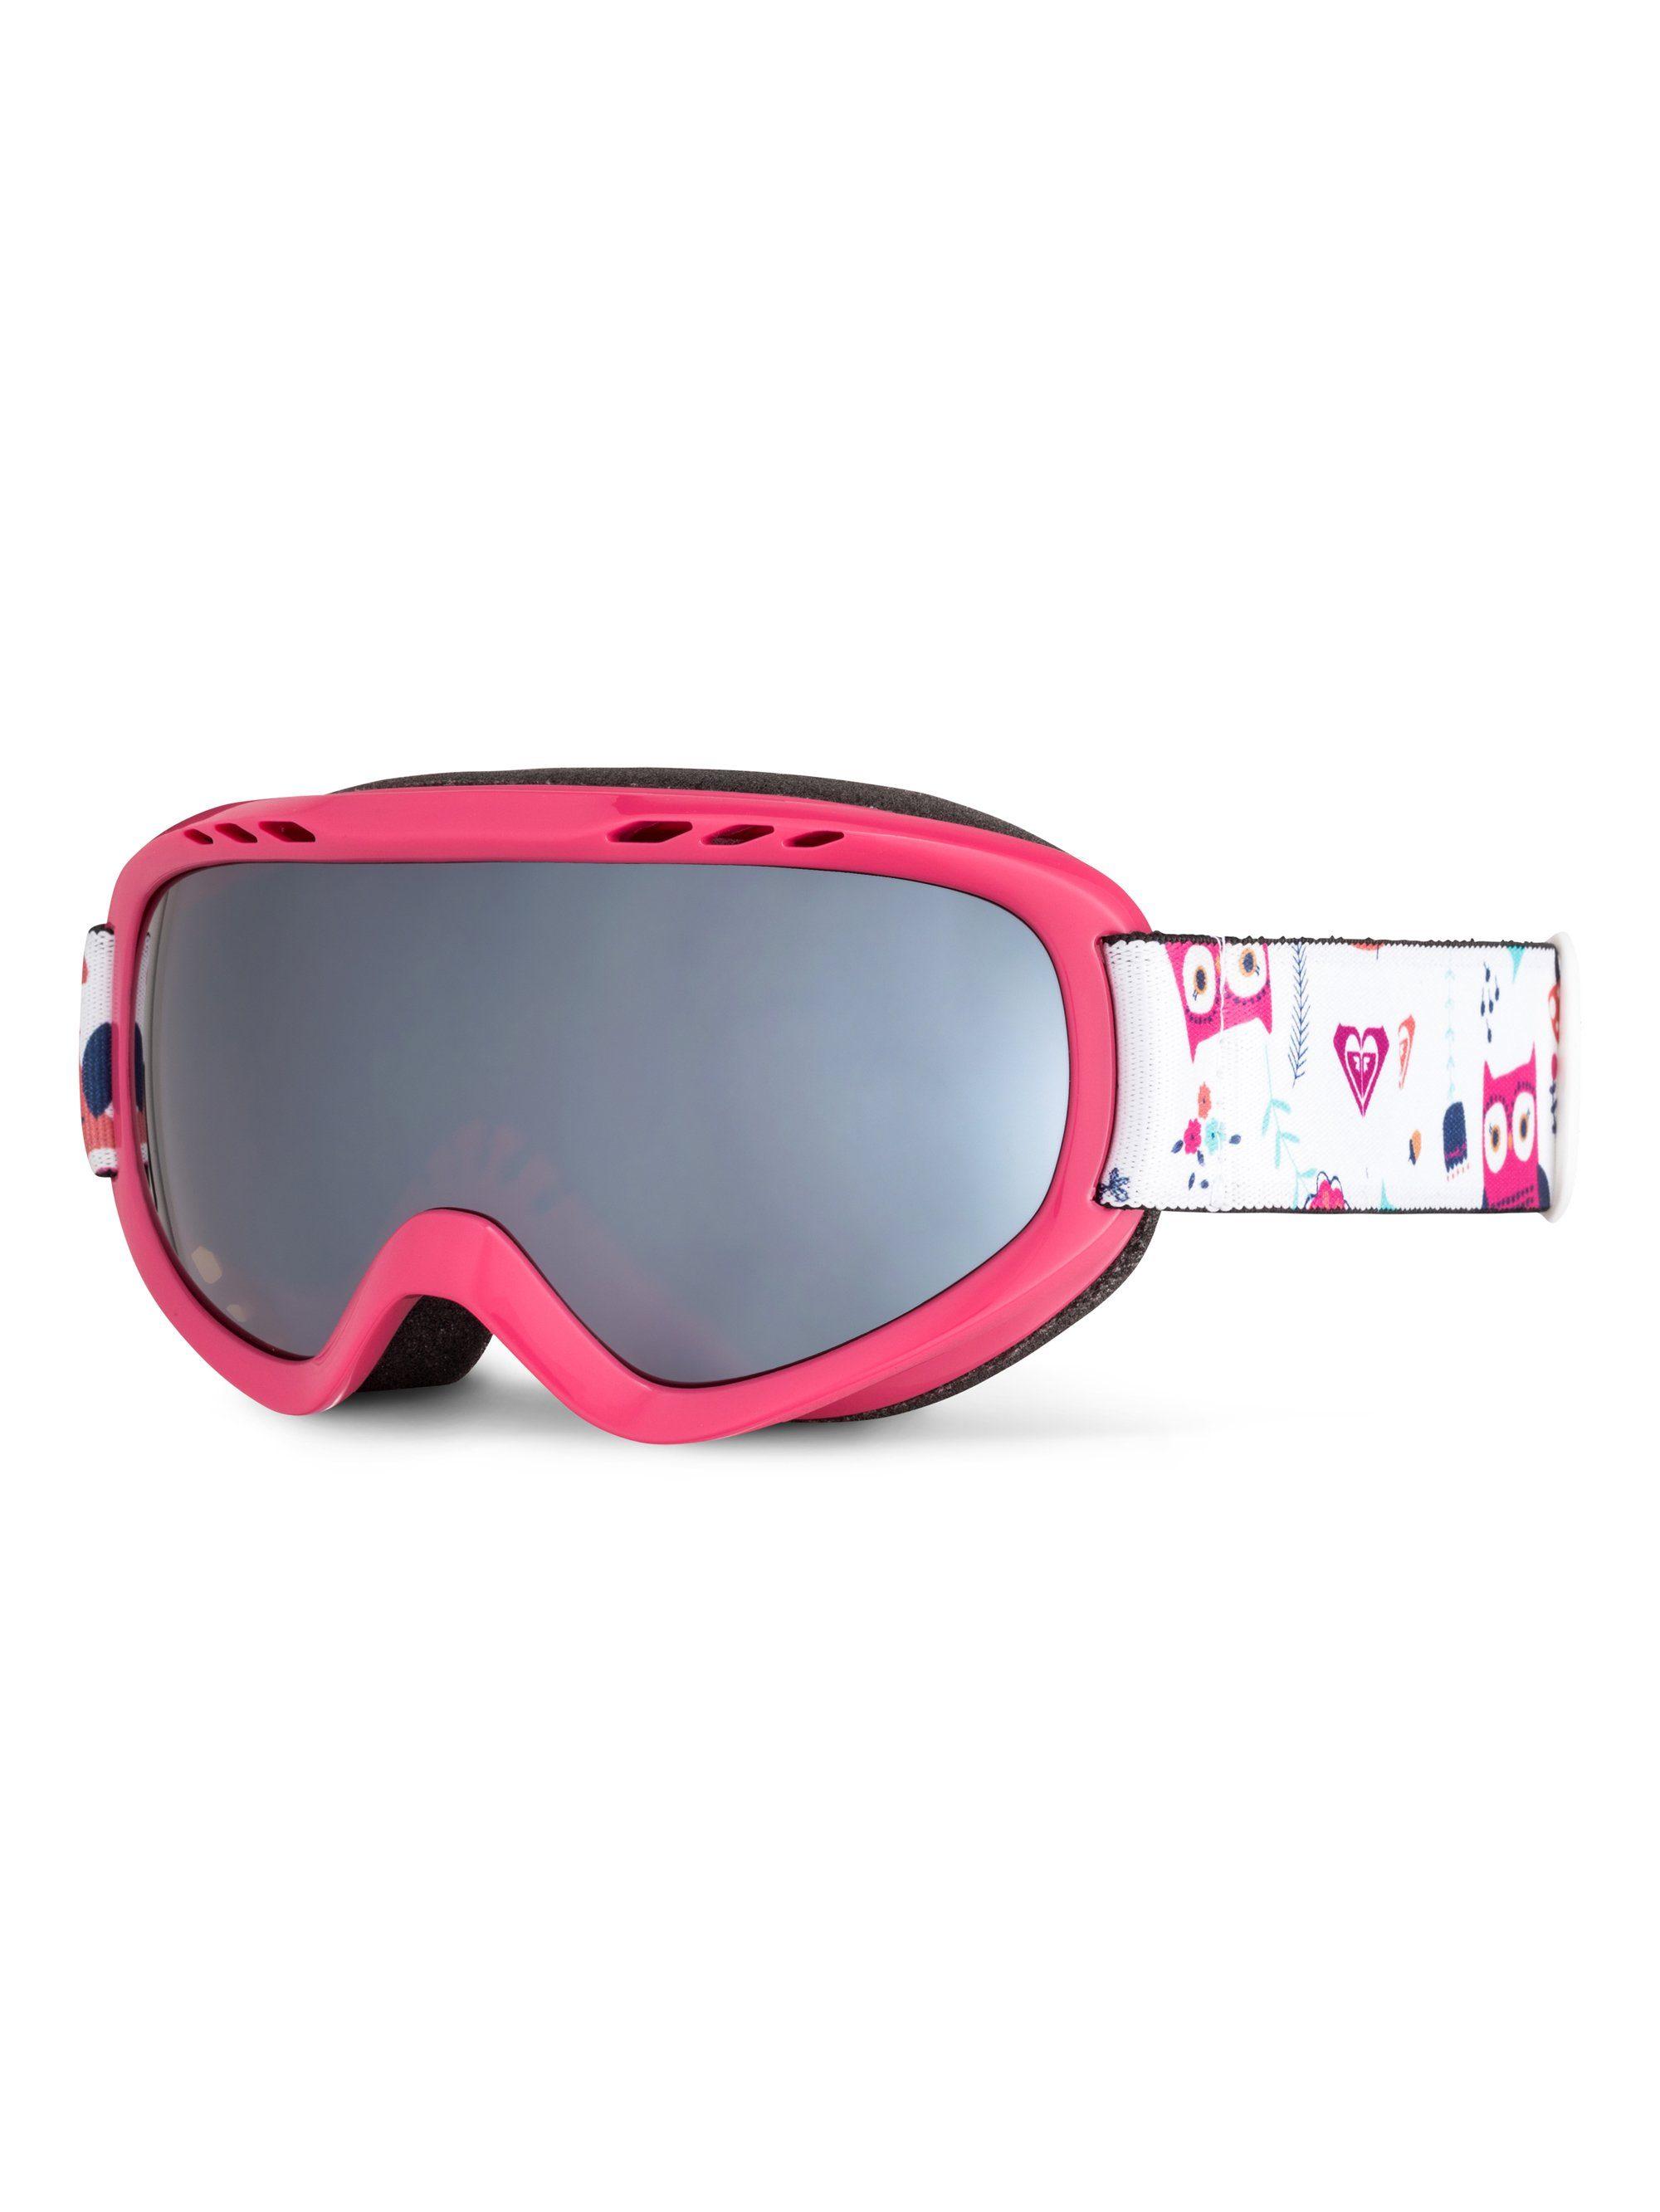 Roxy Snowboard Goggles »Sweet«